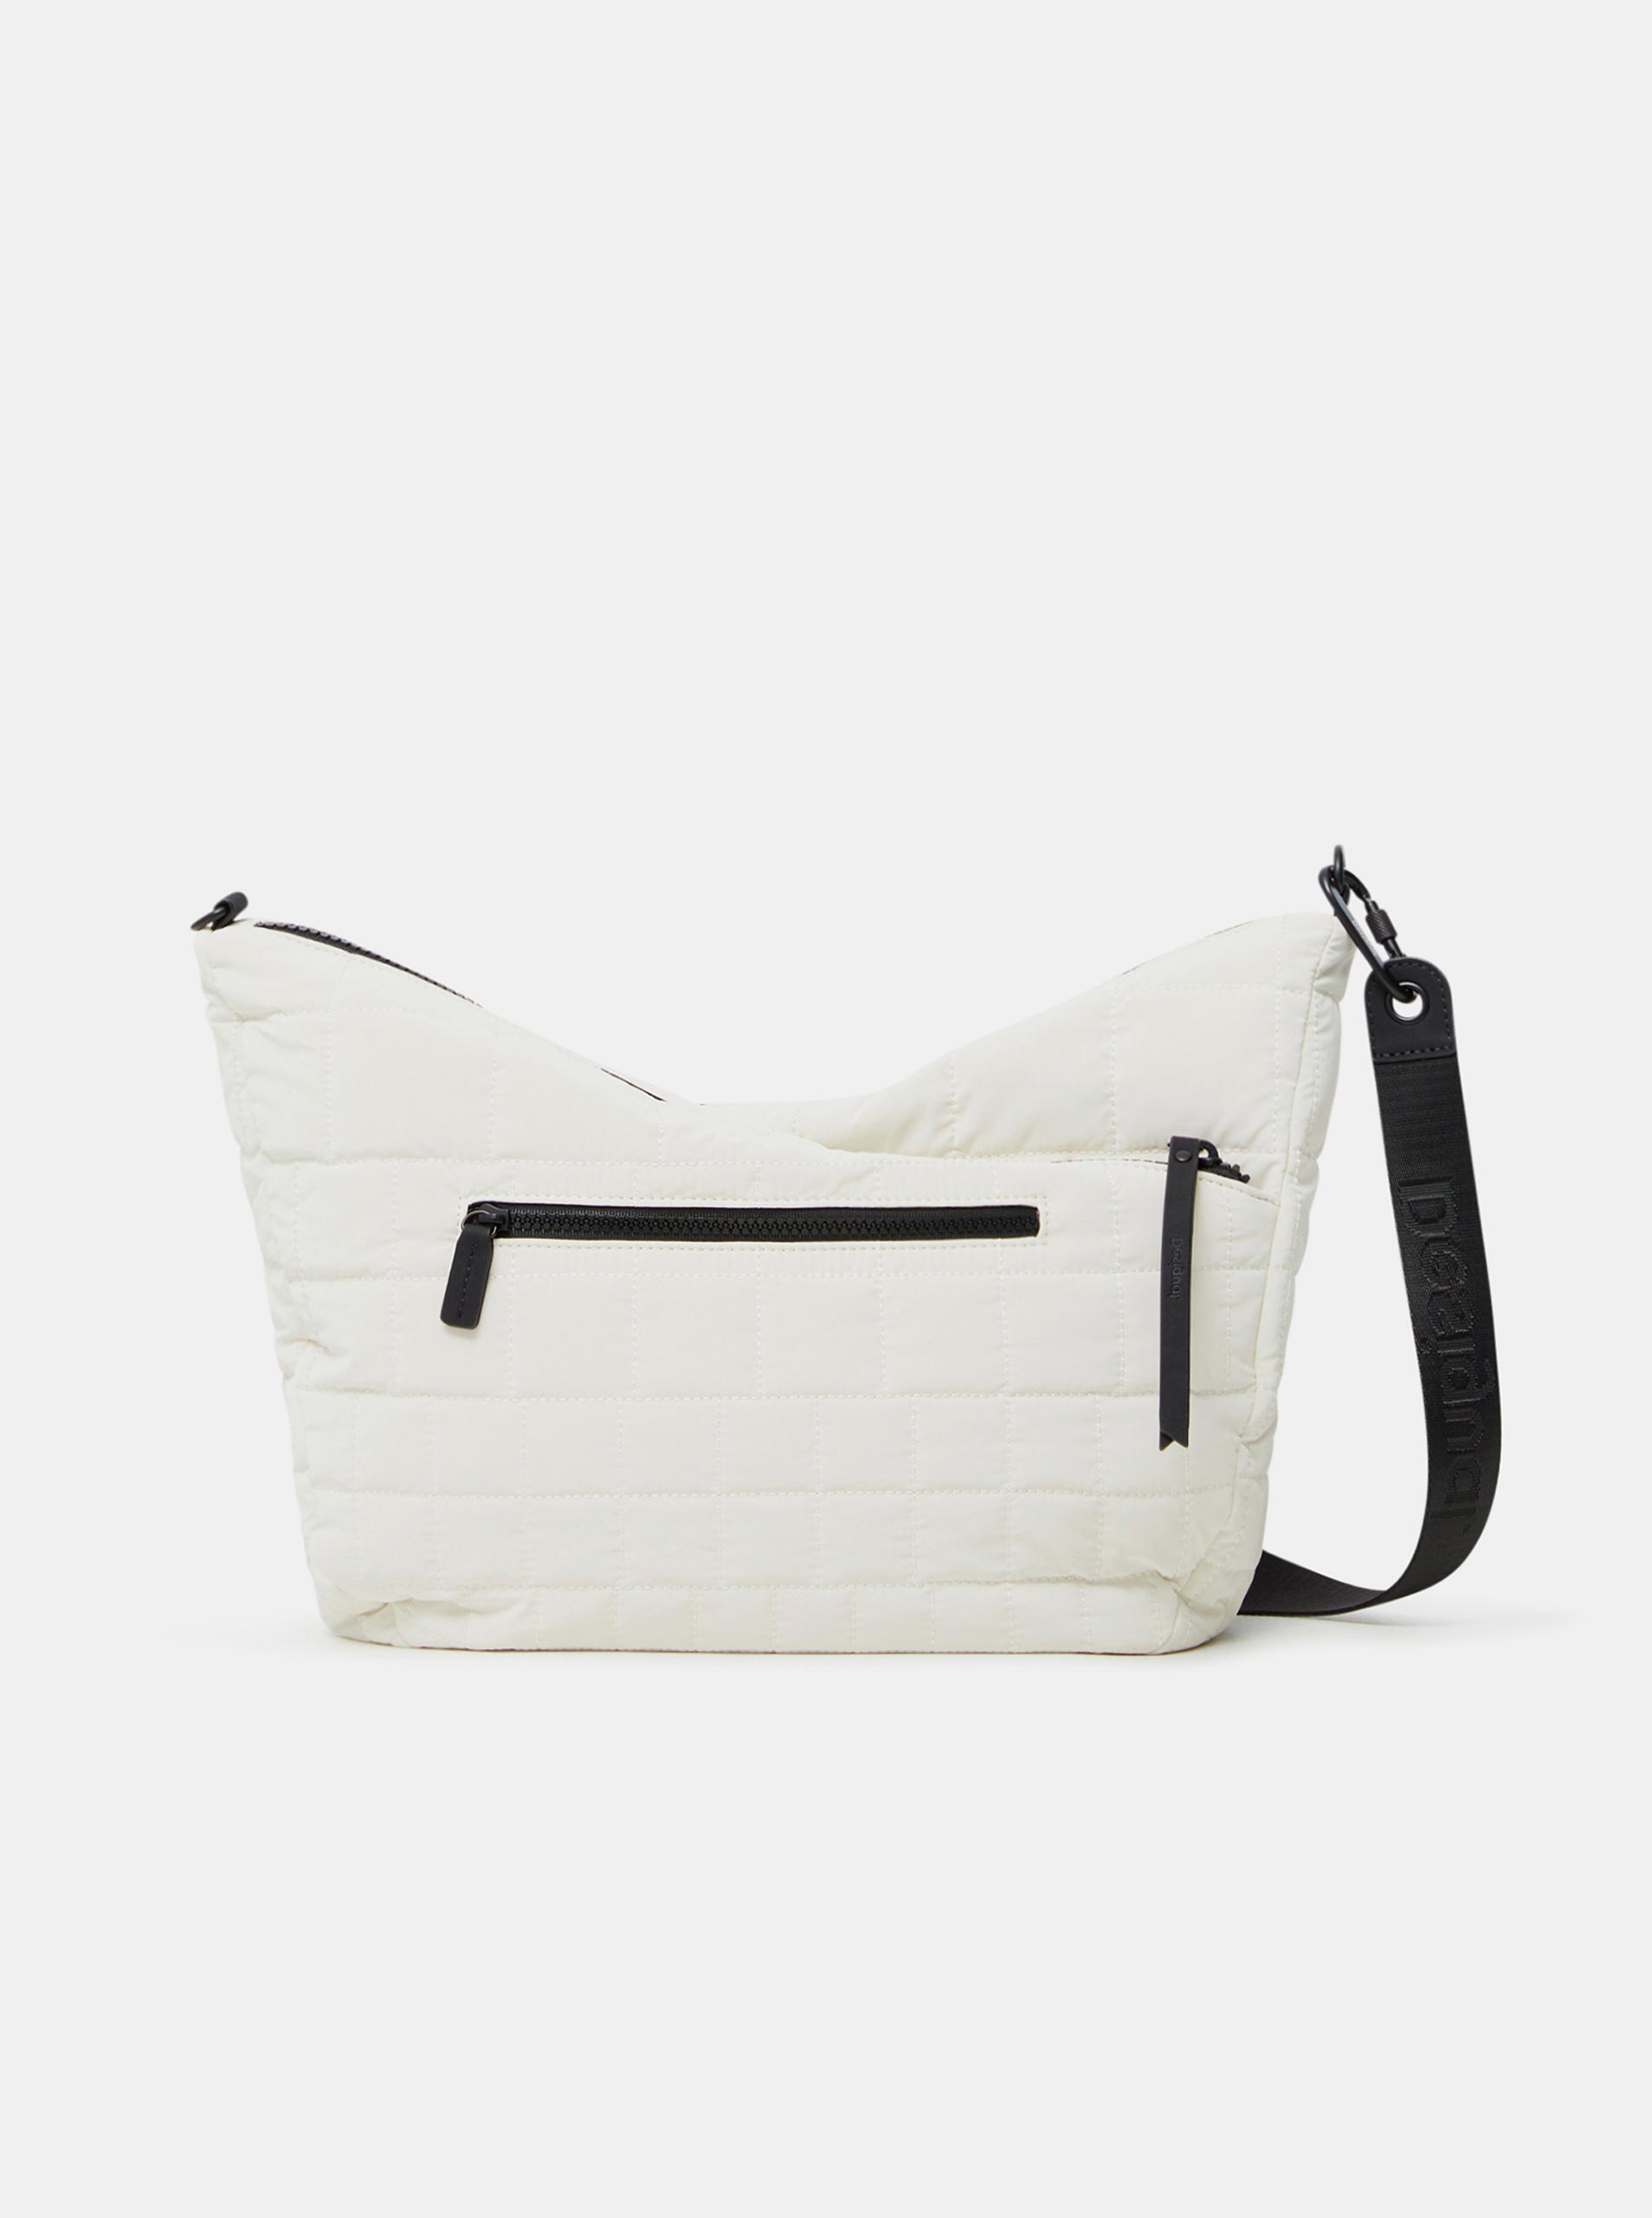 Desigual bílé kabelka COcoa Harry 2.0 Maxy